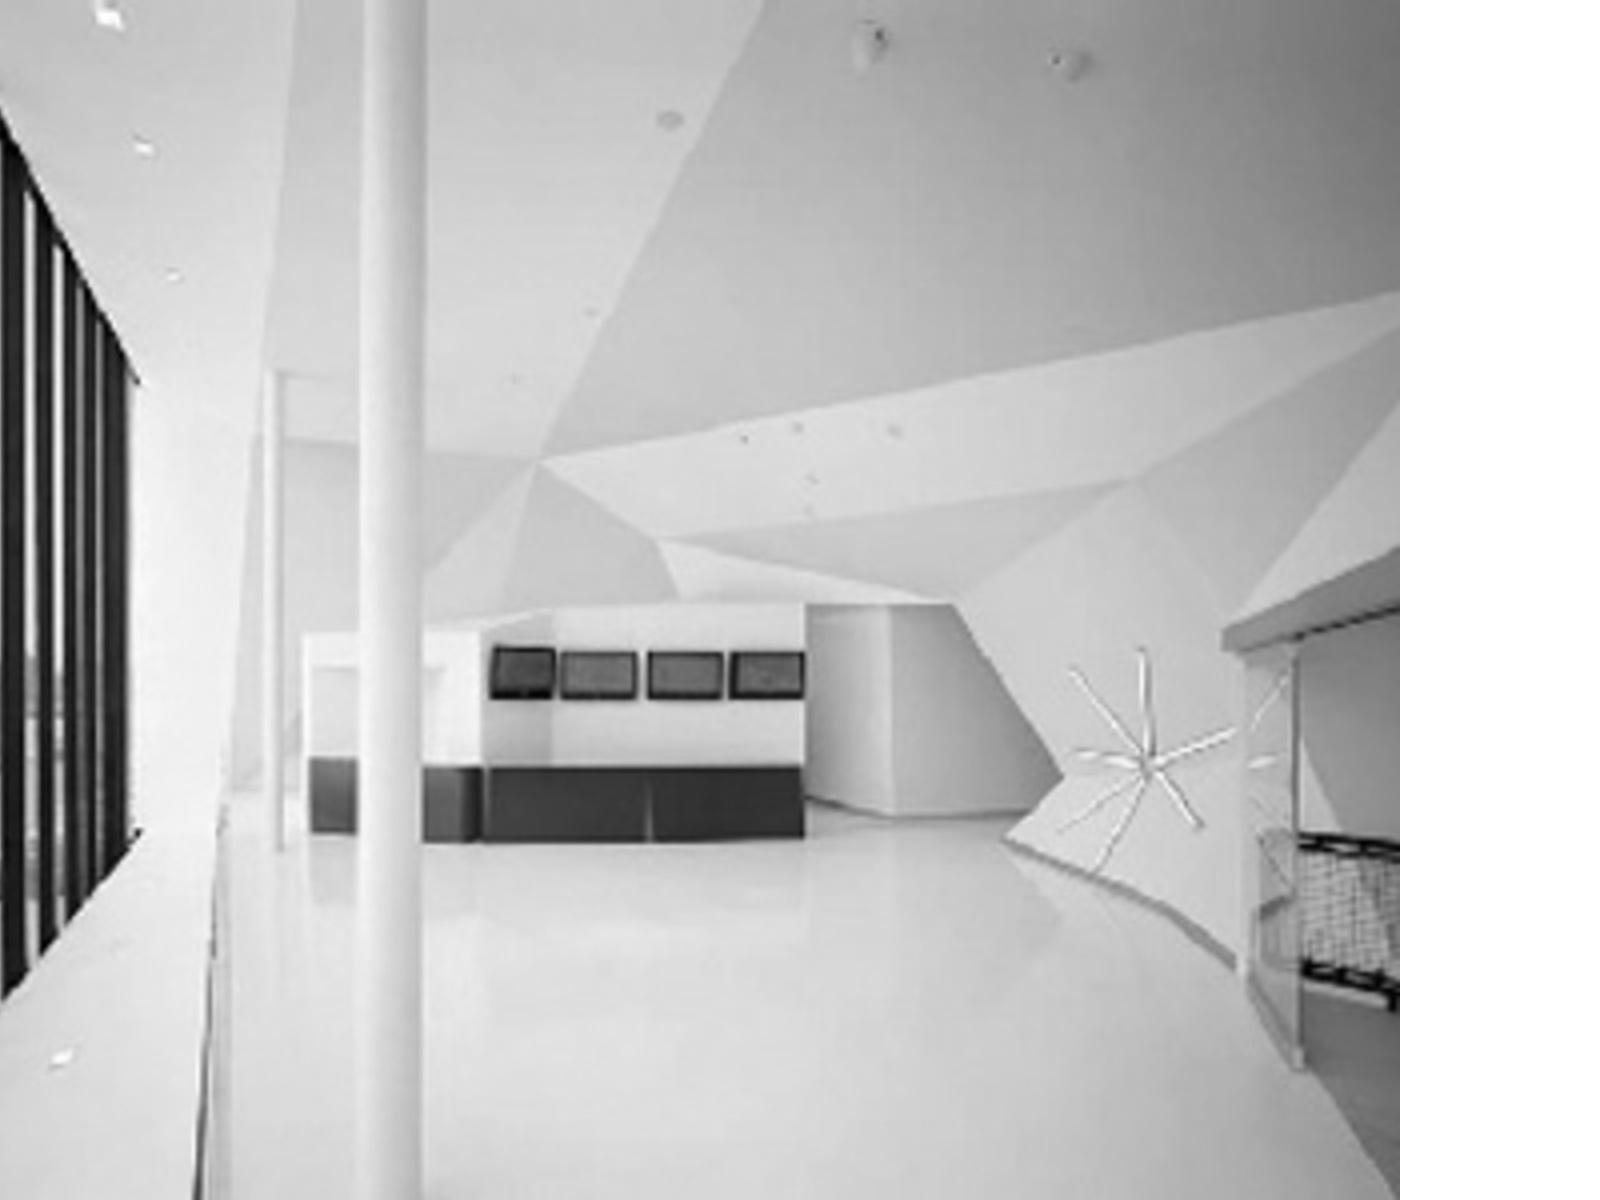 Rojkind Arquitectos: Museo del Cioccolato Città del Messico